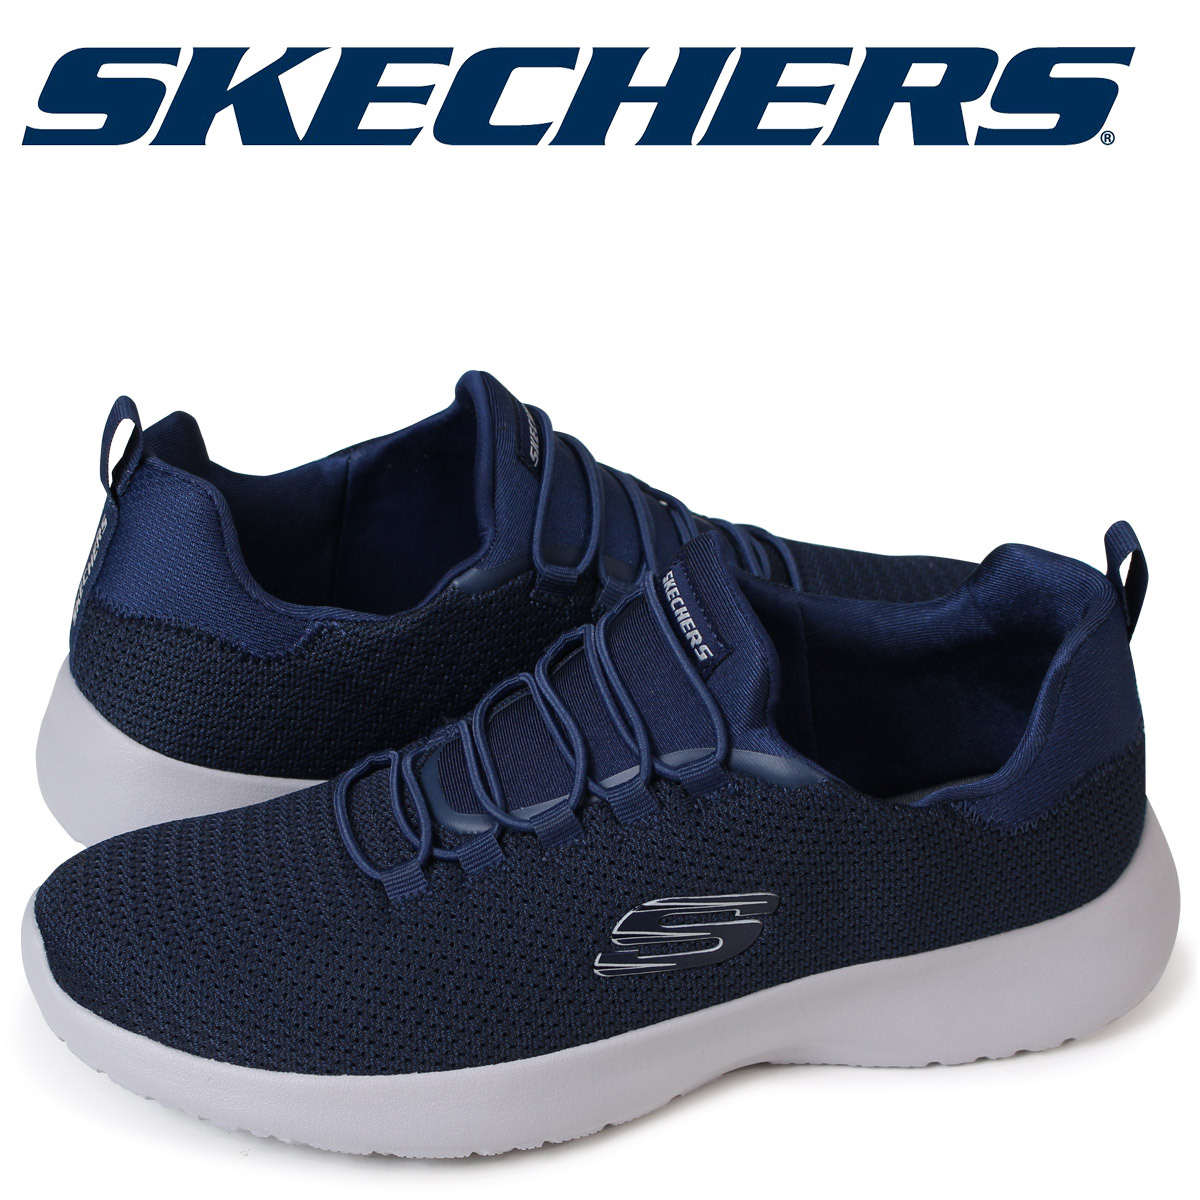 photo Спортивная обувь SKECHERS DYNAMIGHT